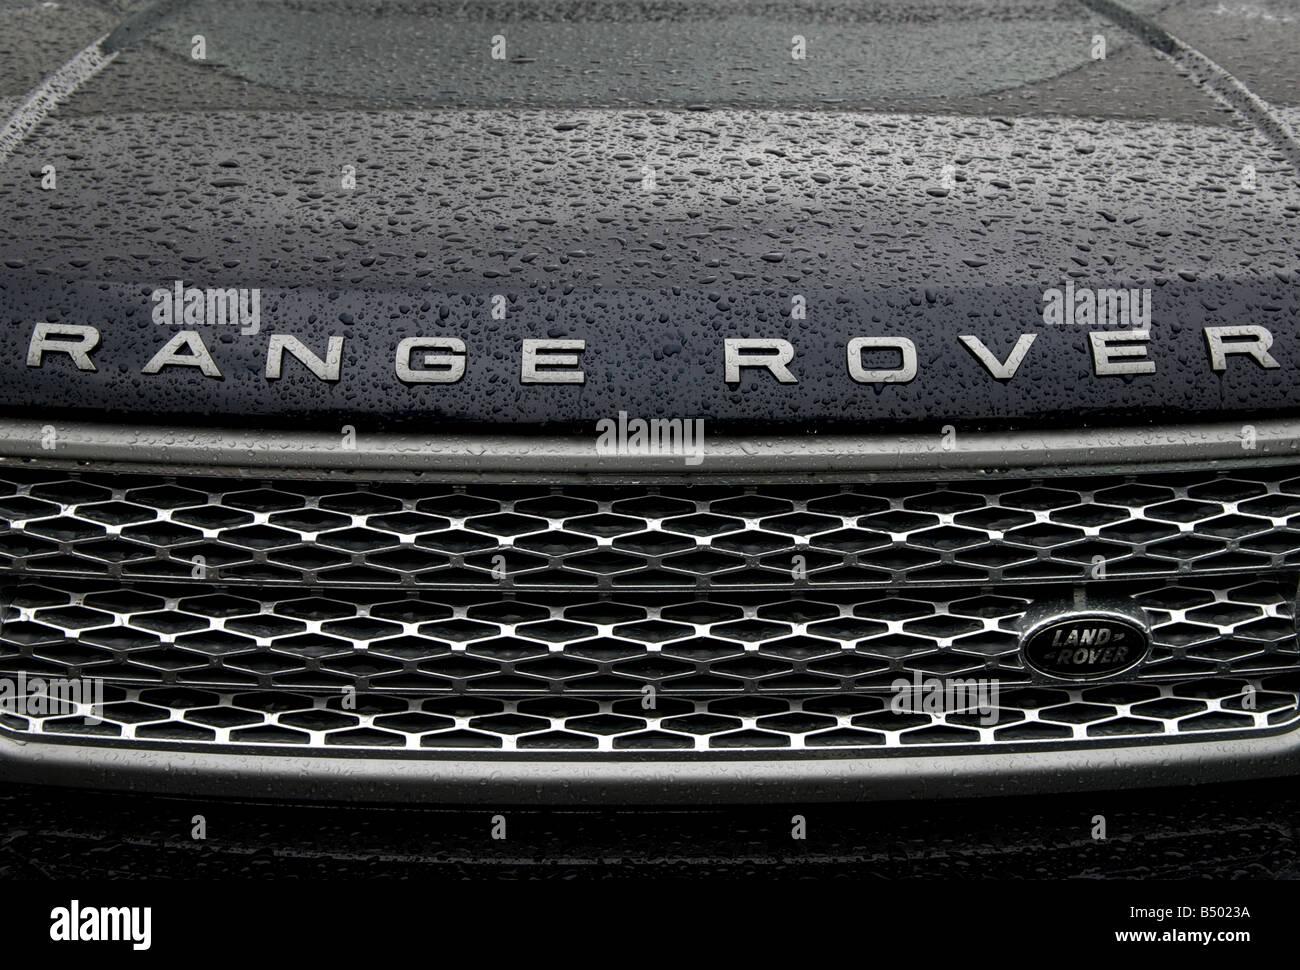 Third generation Range Rover 4x4 car, Ipswich, Suffolk, UK. - Stock Image